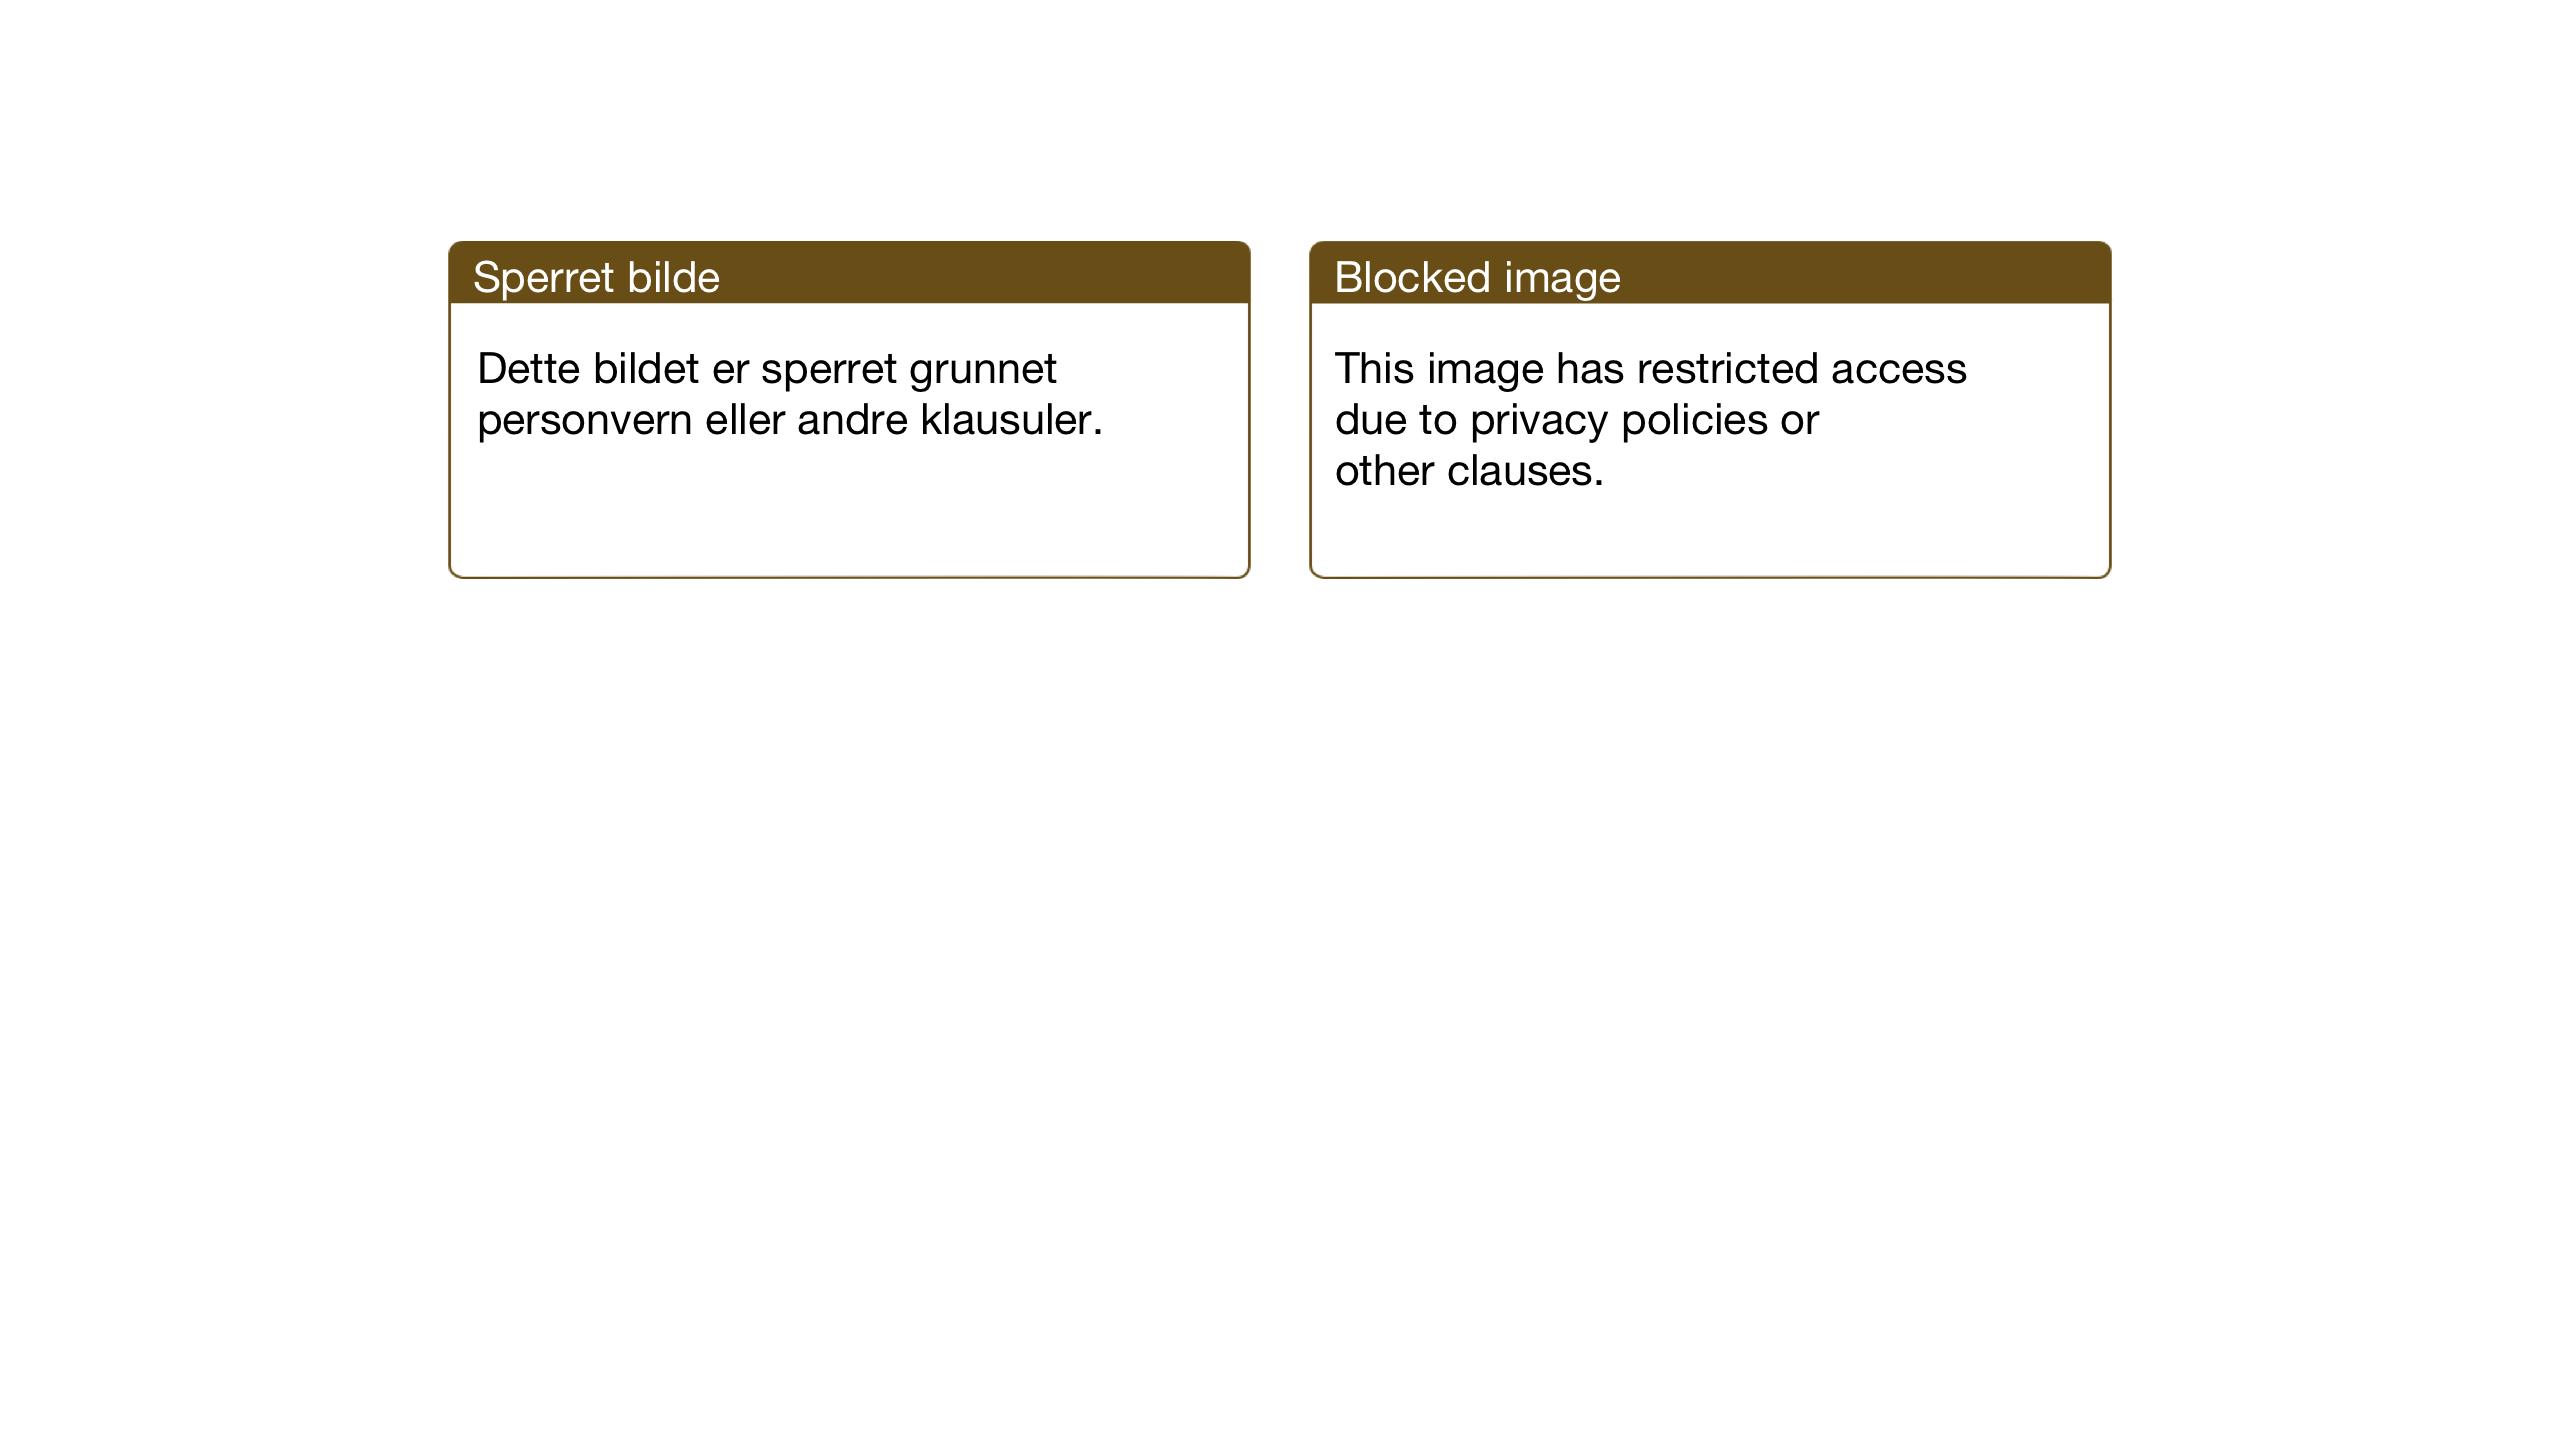 SAH, Vardal prestekontor, H/Ha/Haa/L0018: Ministerialbok nr. 18, 1930-1945, s. 154